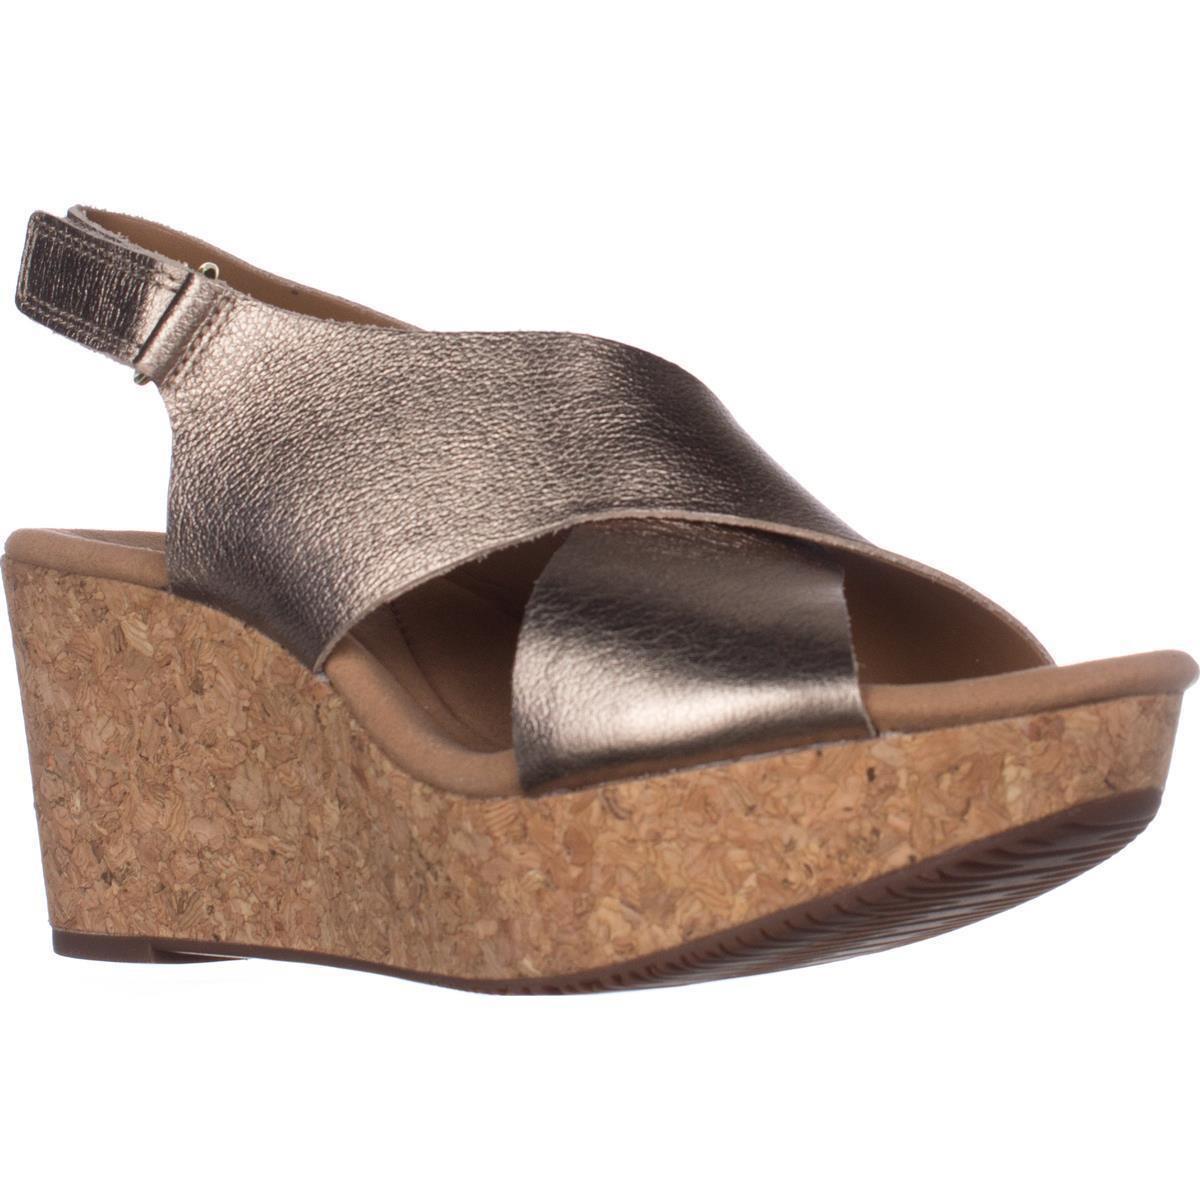 d5a312e9c7a2 Lyst - Clarks Annadel Eirwyn Comfort Wedge Sandals in Metallic